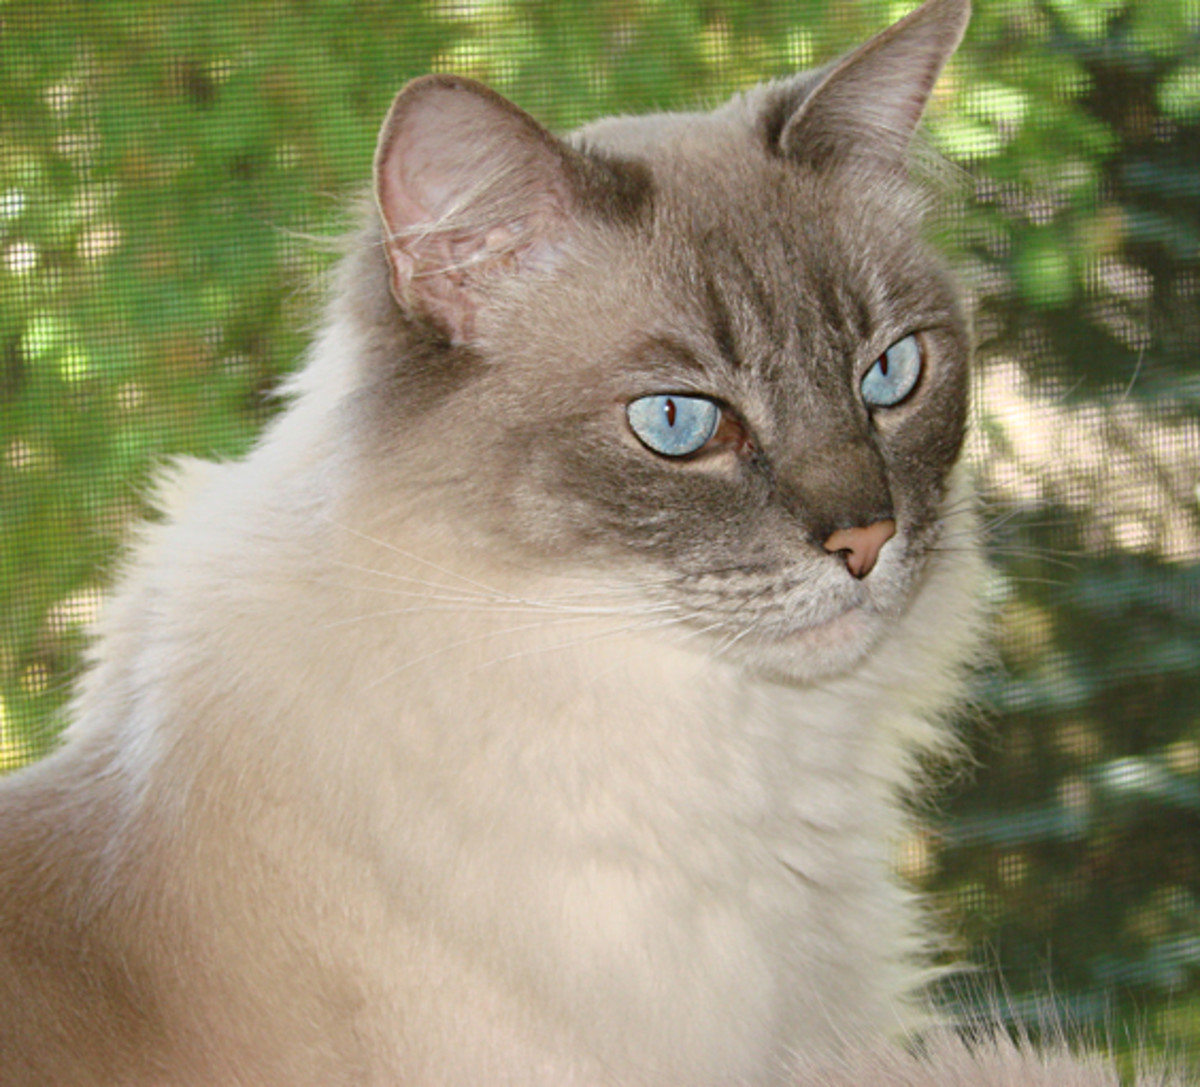 Bennie is one of my ragdoll cats.